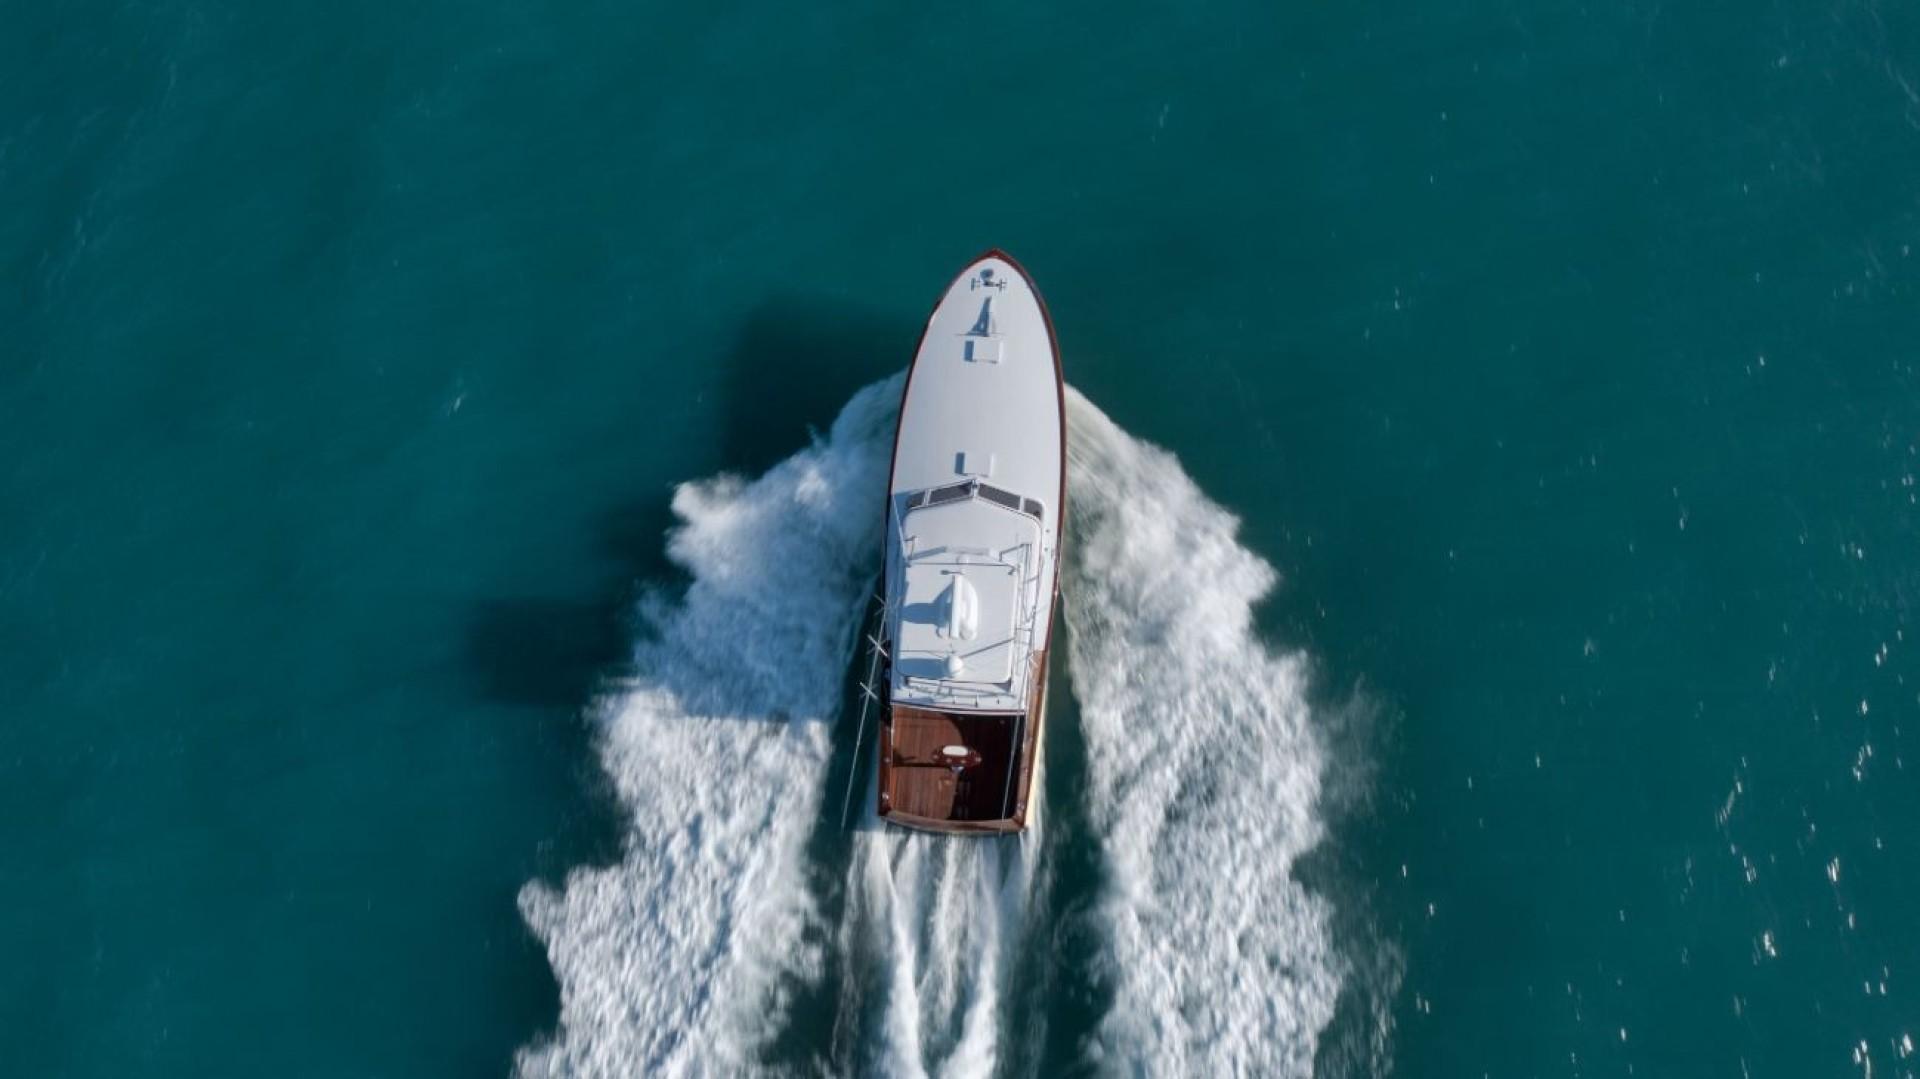 Rybovich 45 - Cygnet - overhead